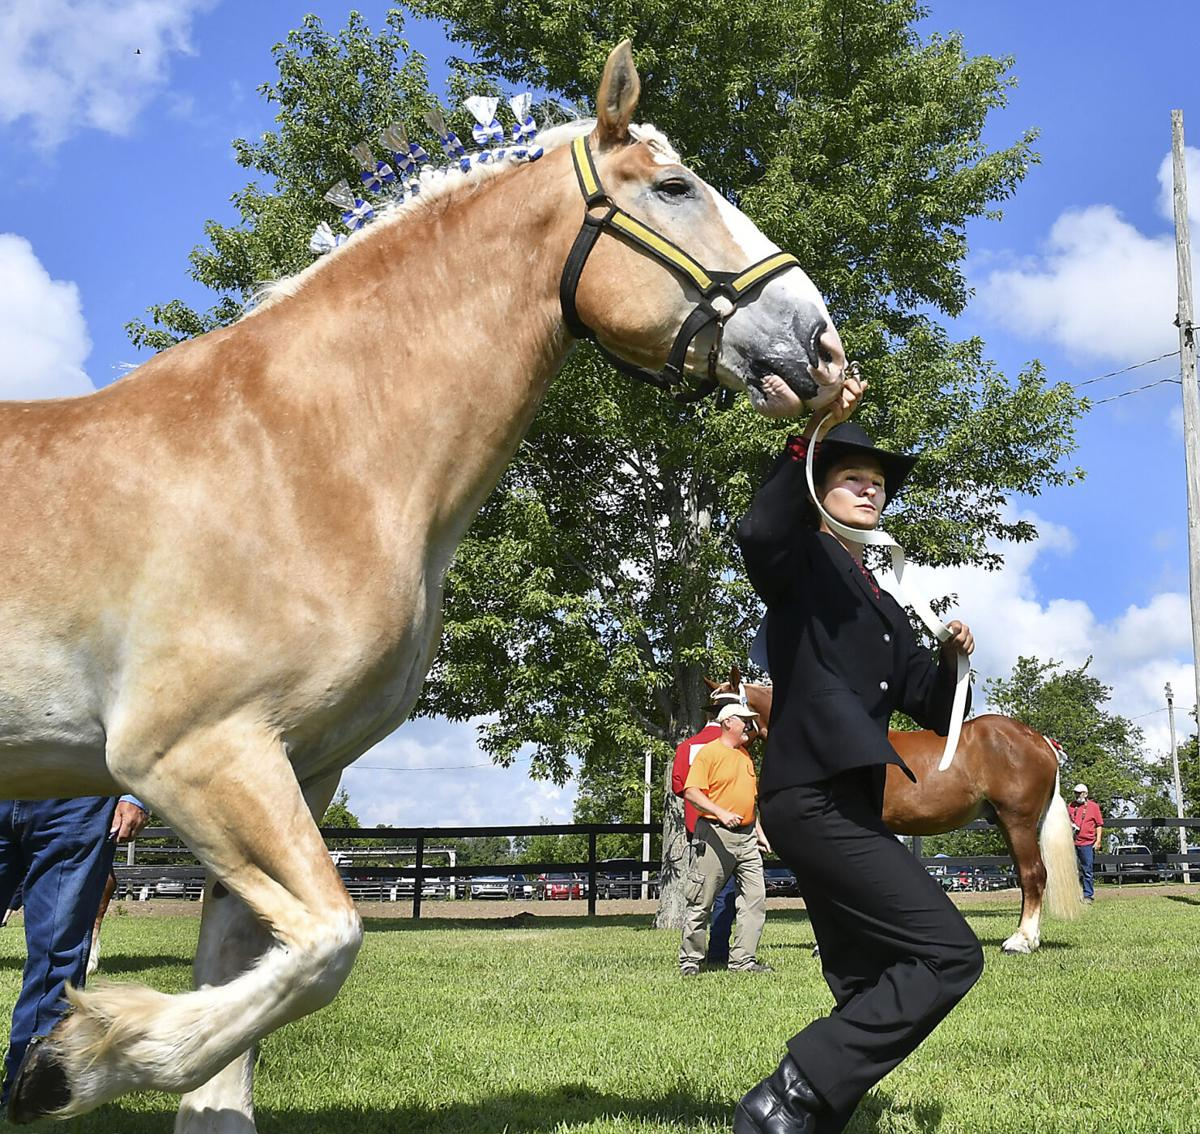 20200730-nws-10year4hmemberbios horse show